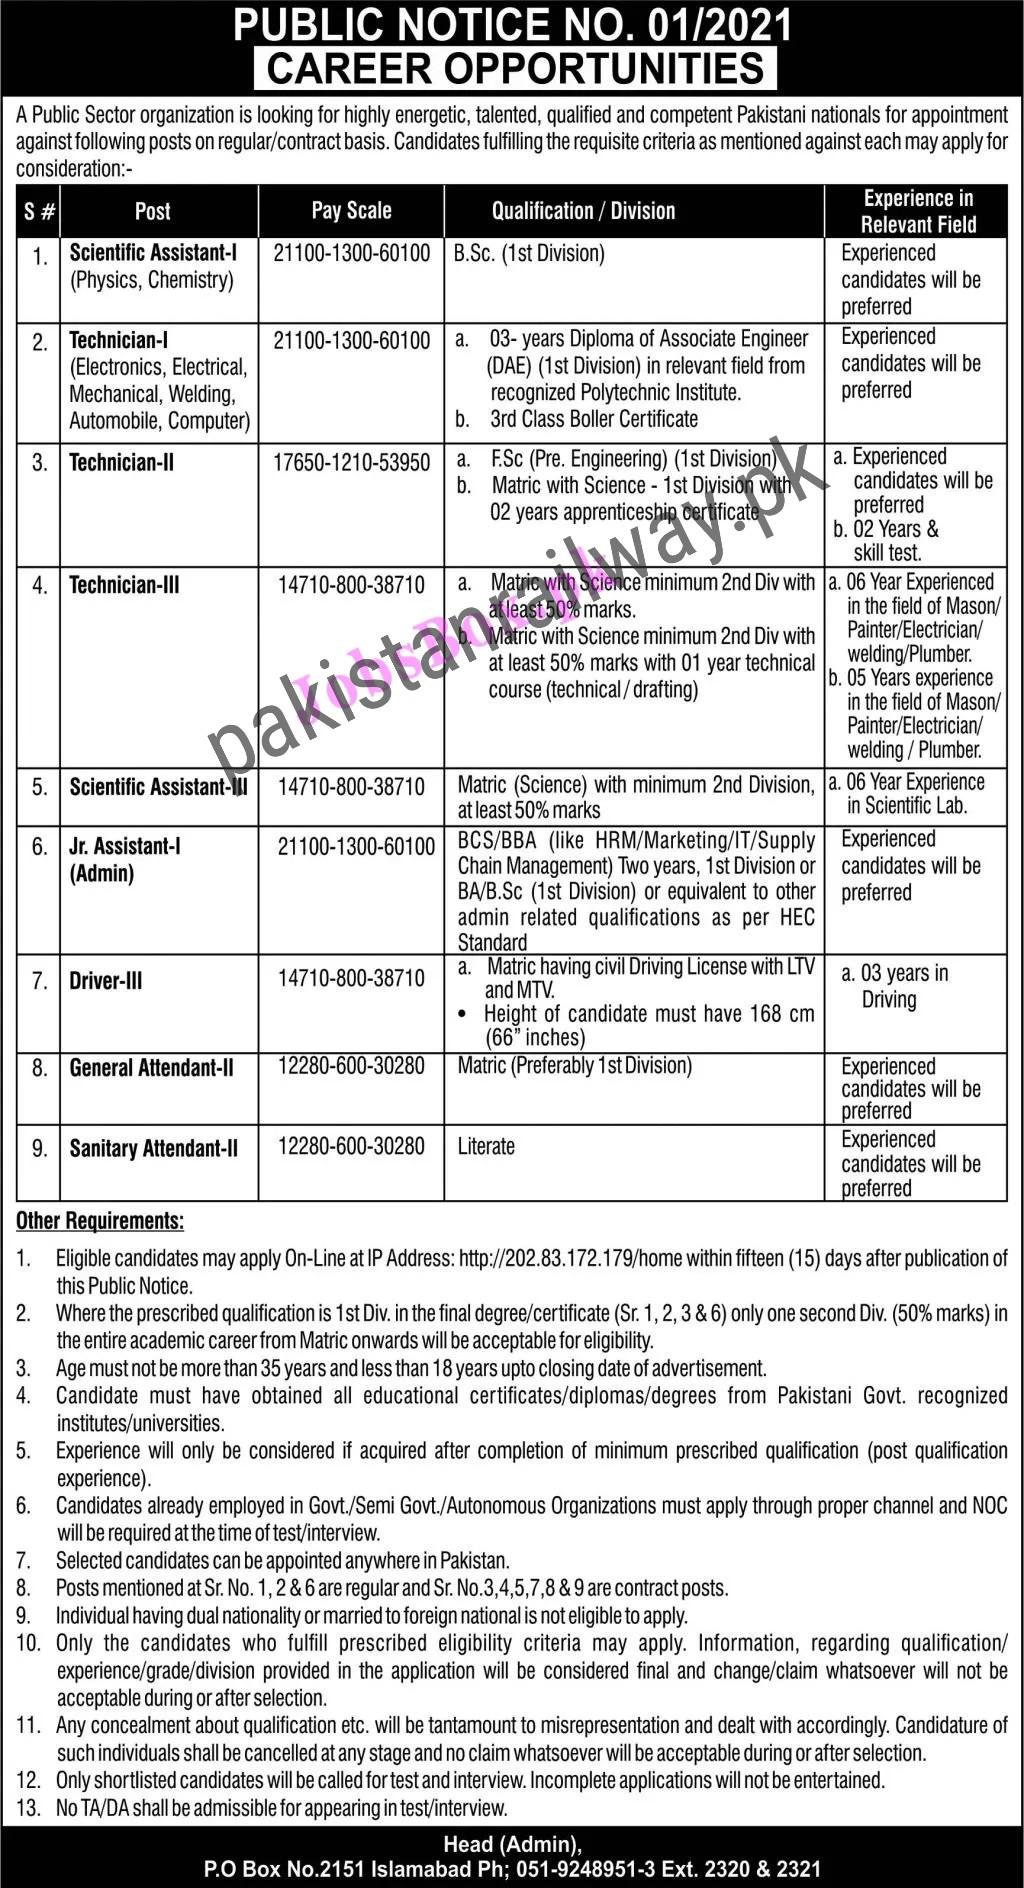 Pakistan Atomic Energy Jobs Today 2021 At PAEC Apply online